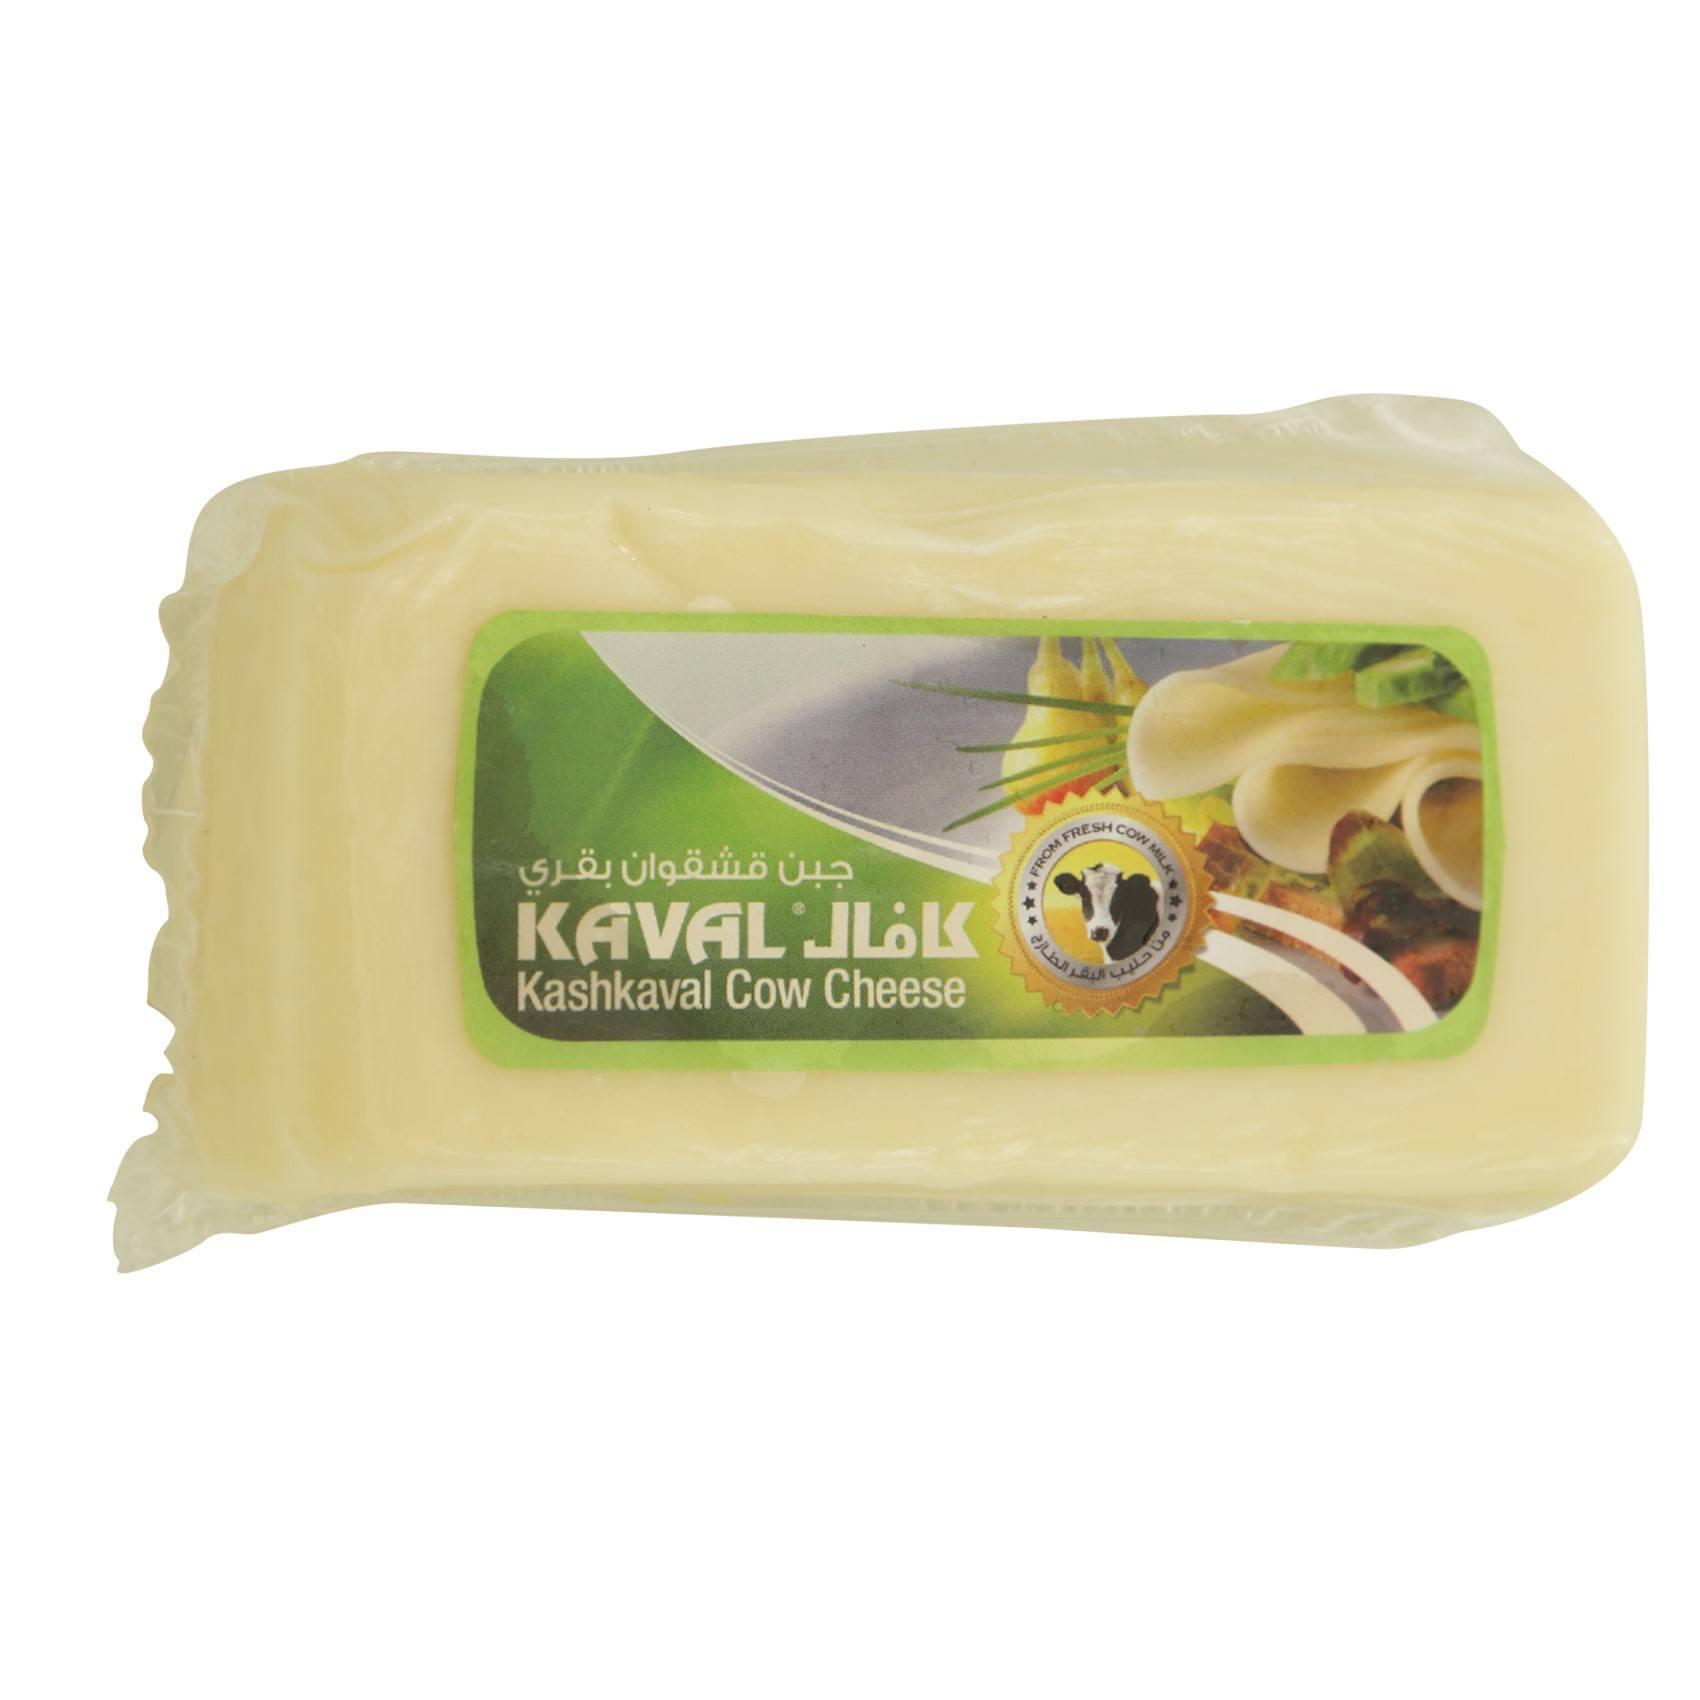 KASHKAVAL COW 275G